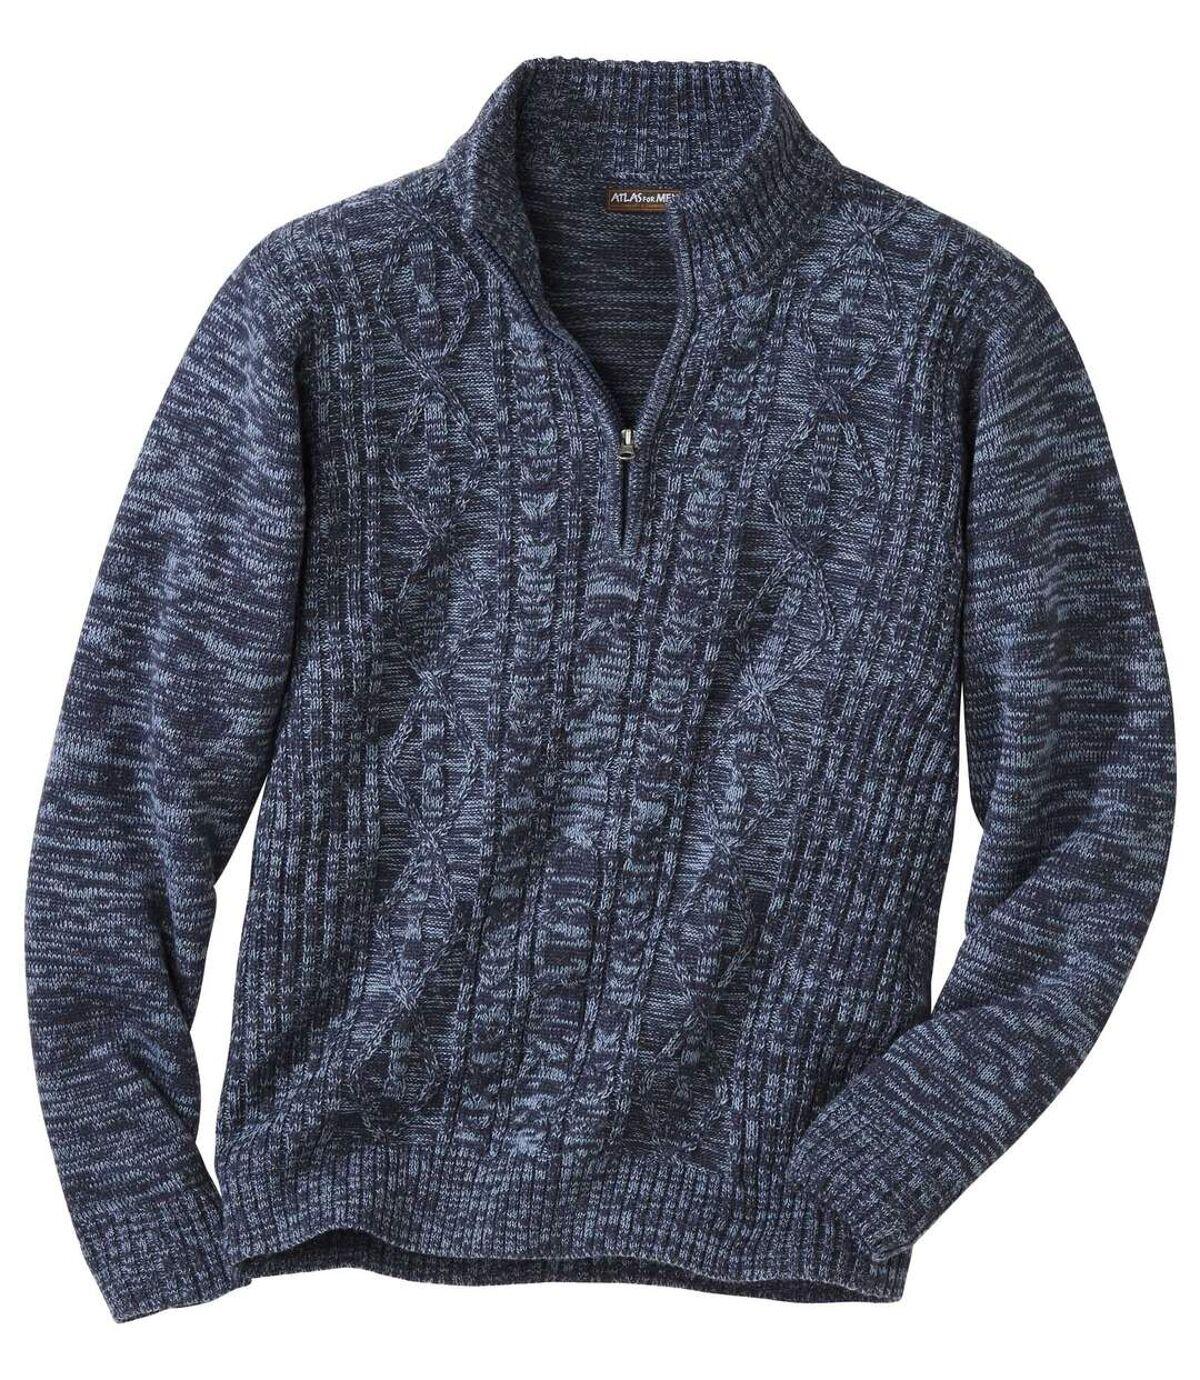 Sweter z warkoczami Rio Grande Atlas For Men